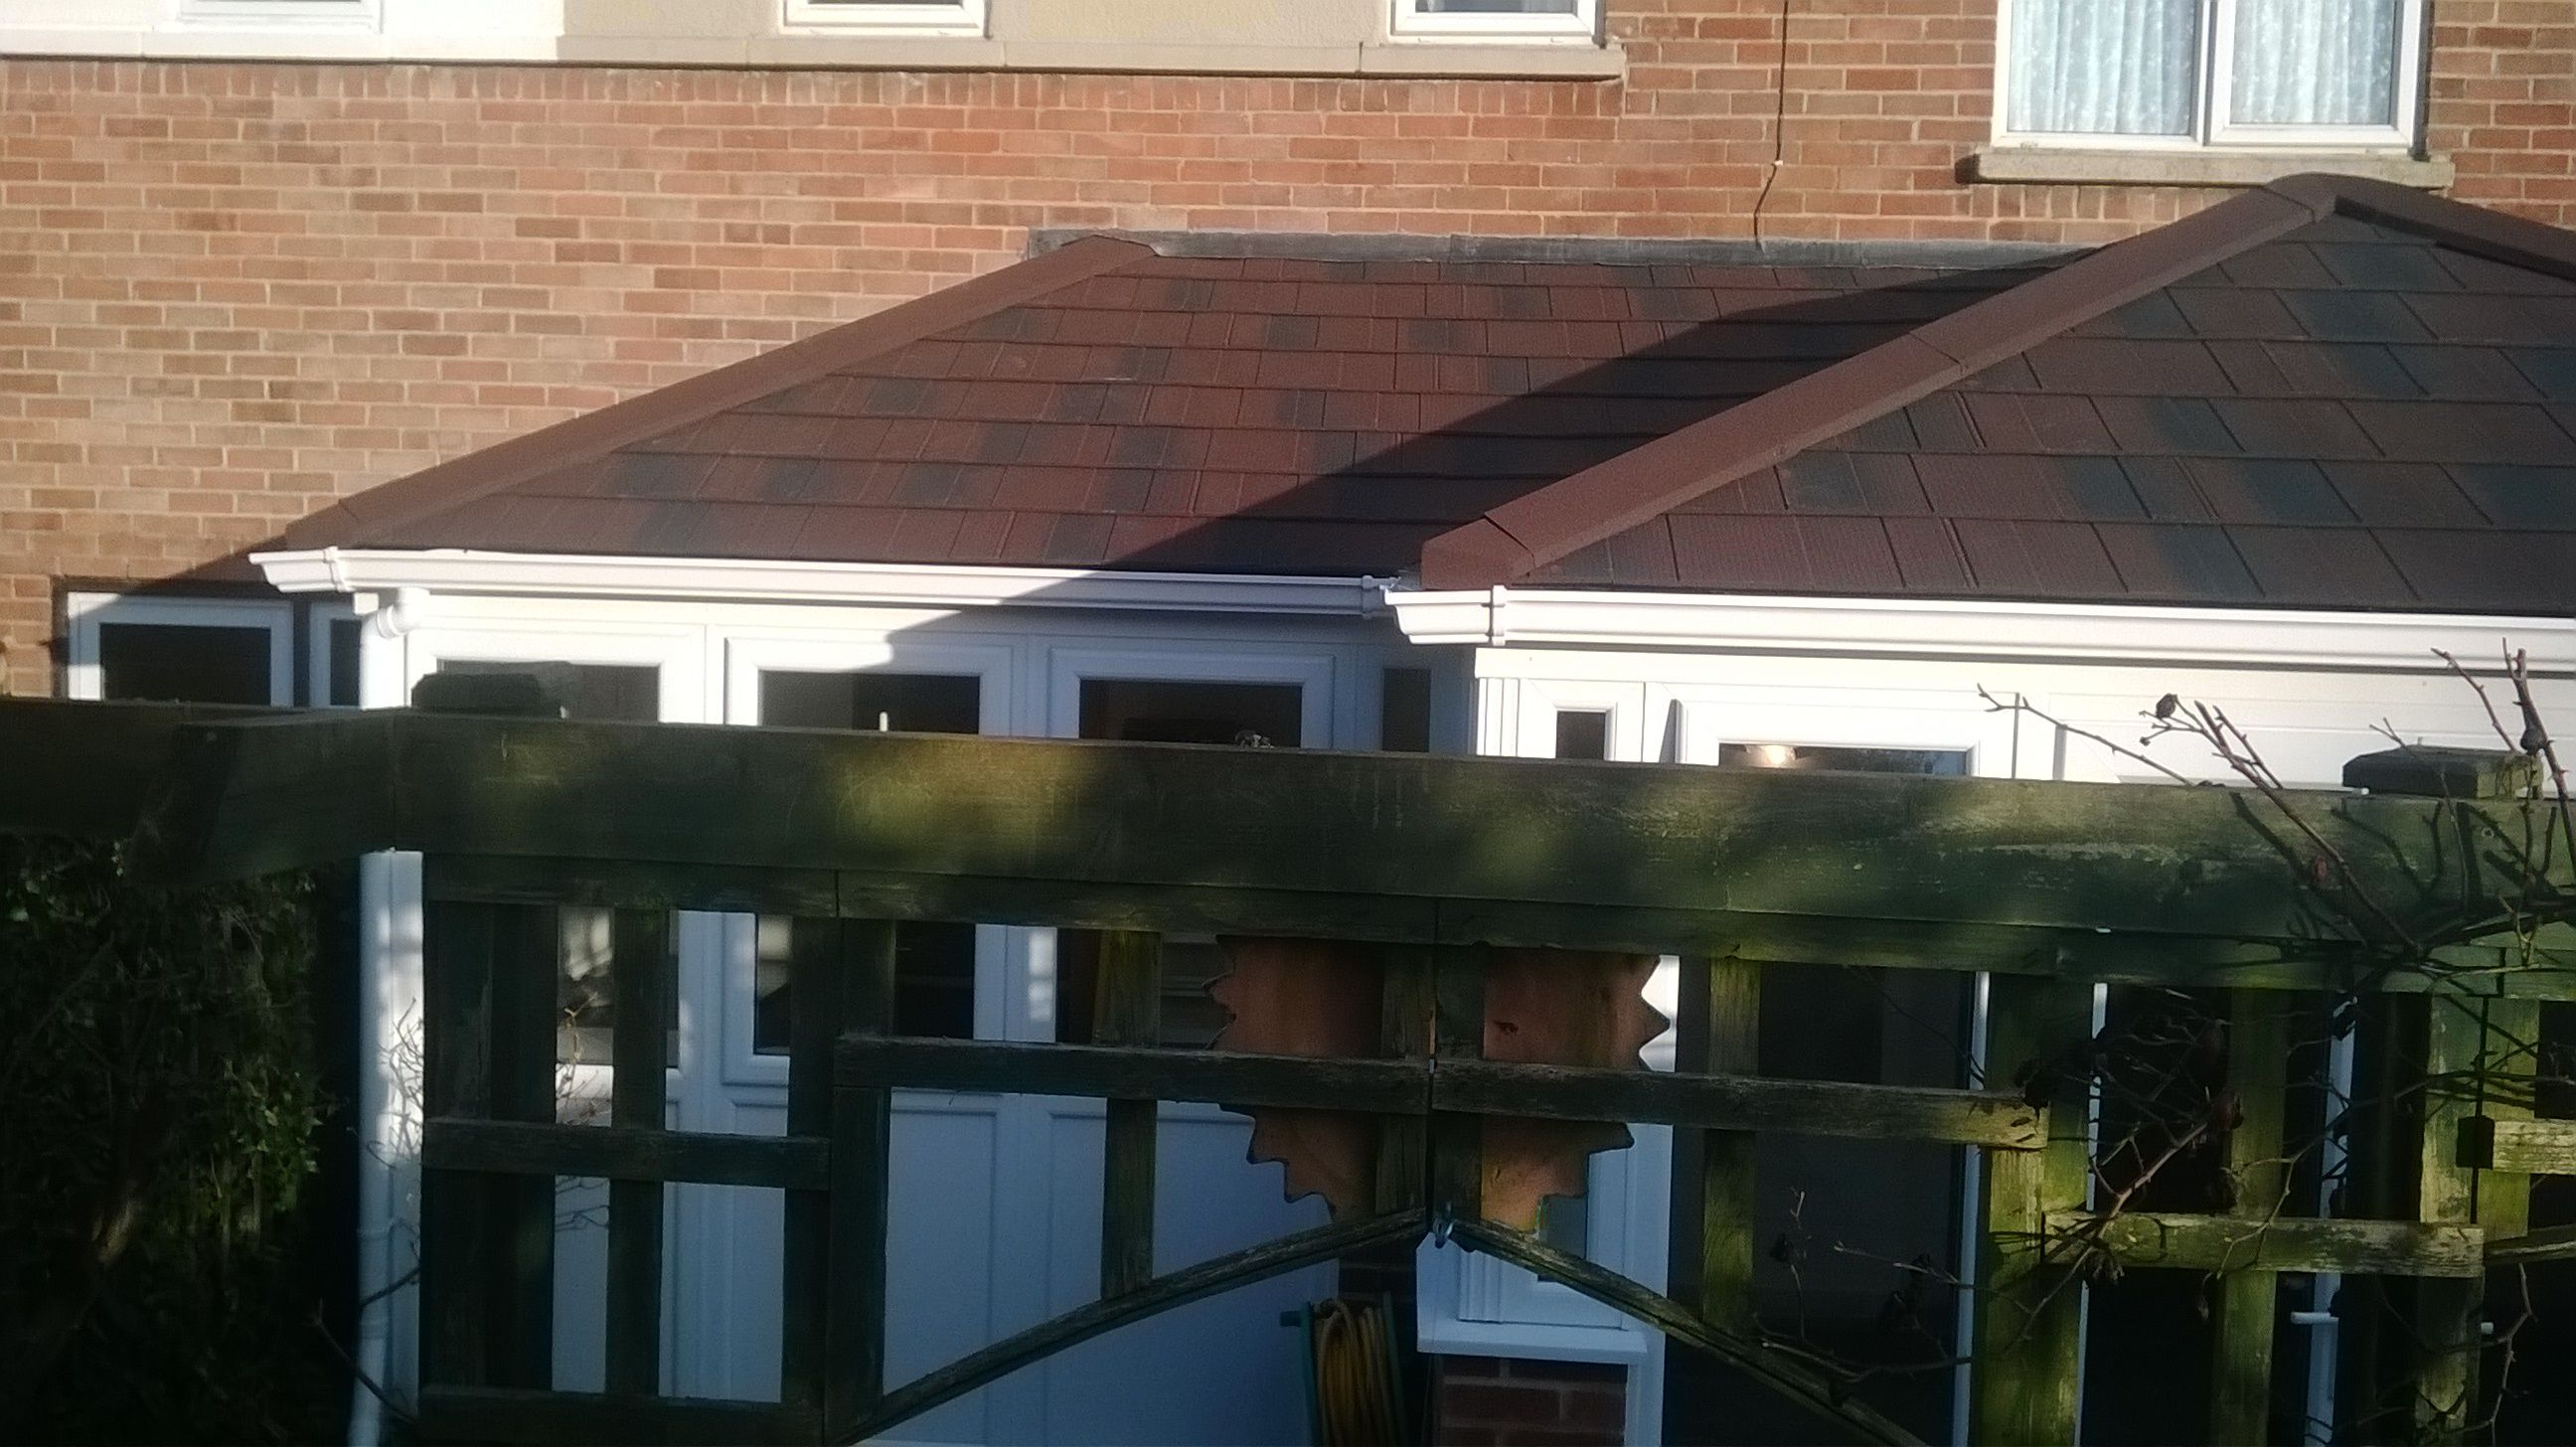 P Shaped Edwardian In Burnt Umber Metro Tile Tiled Conservatory Roof Conservatory Roof Conservatory